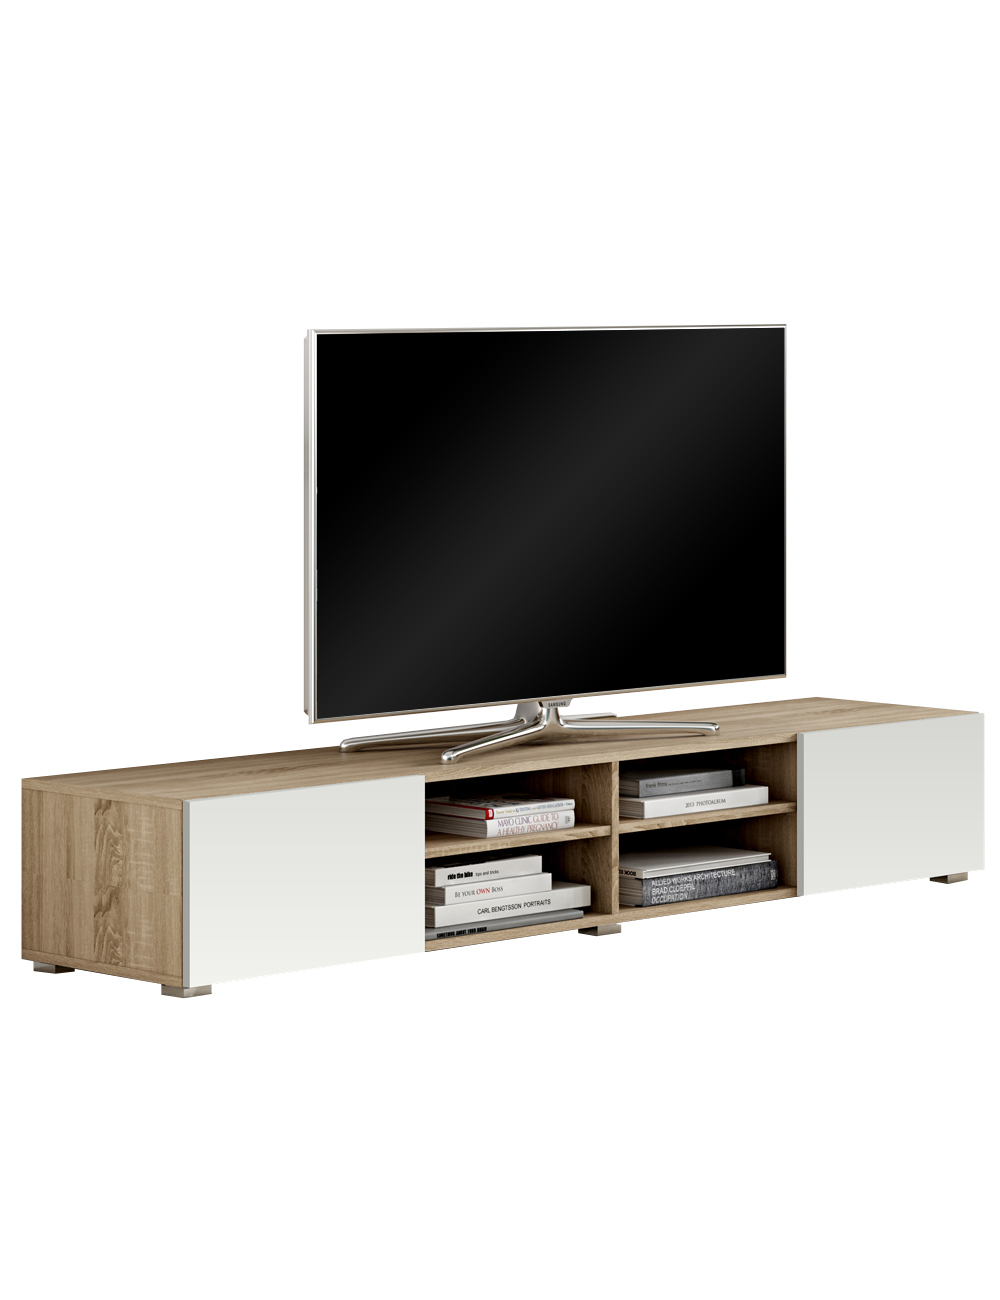 matelas prestige 7 zones confort garanti 140 x 200 cm. Black Bedroom Furniture Sets. Home Design Ideas